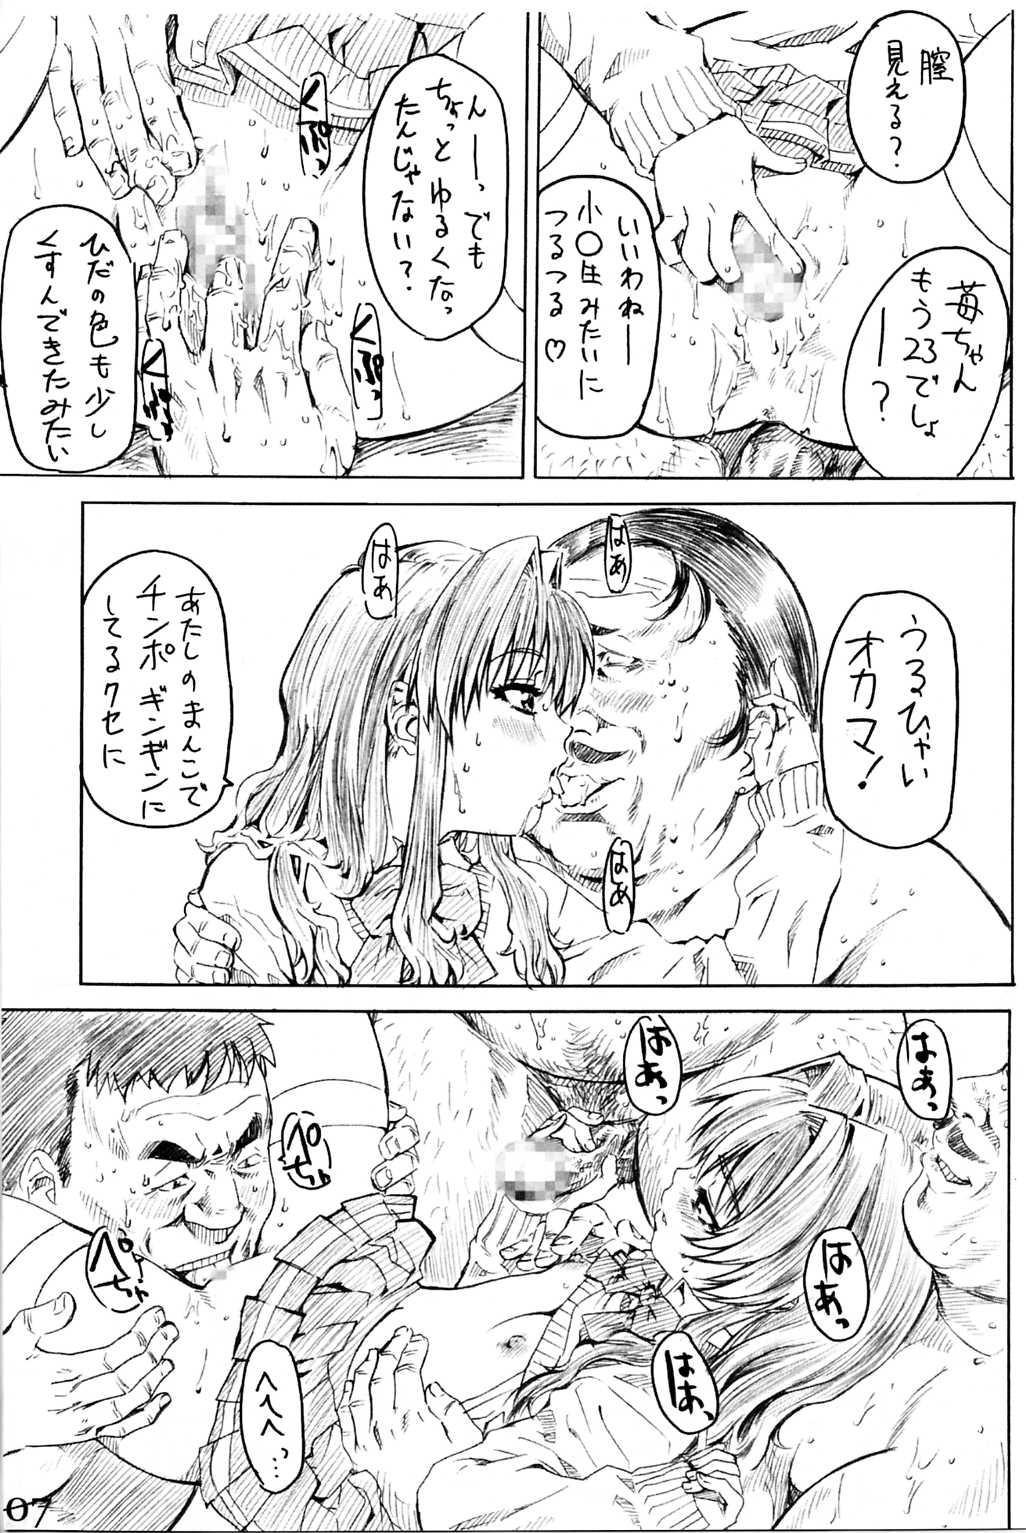 Milk wo Kaketa Ichigotan 5